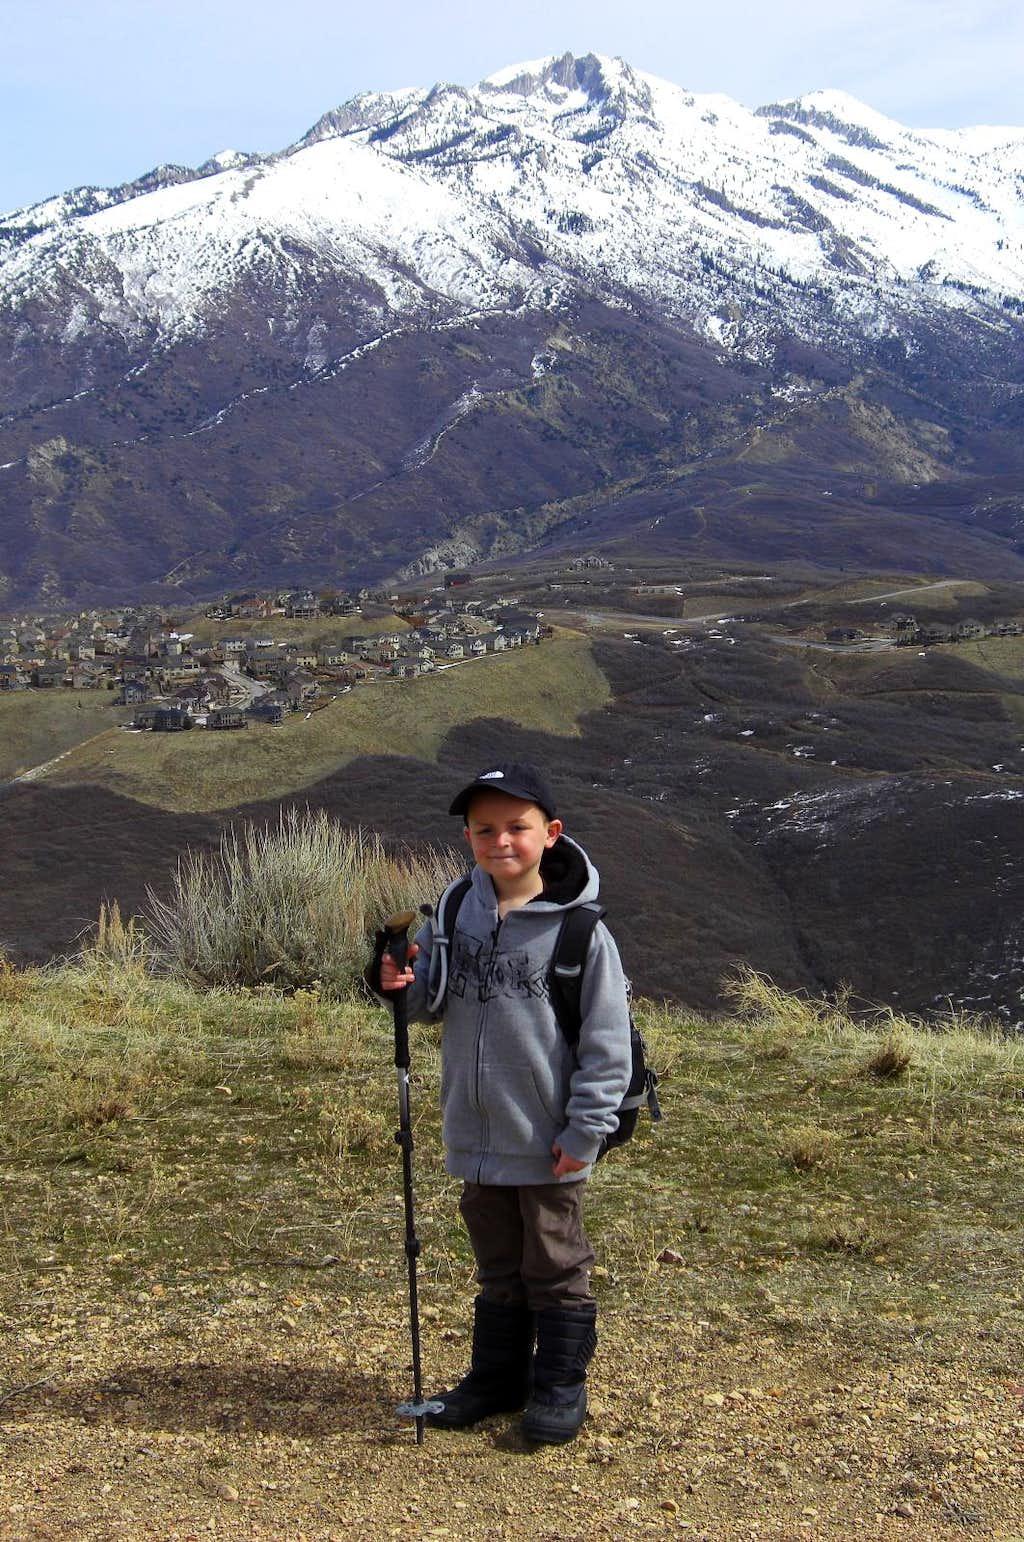 Me and Lone Peak.